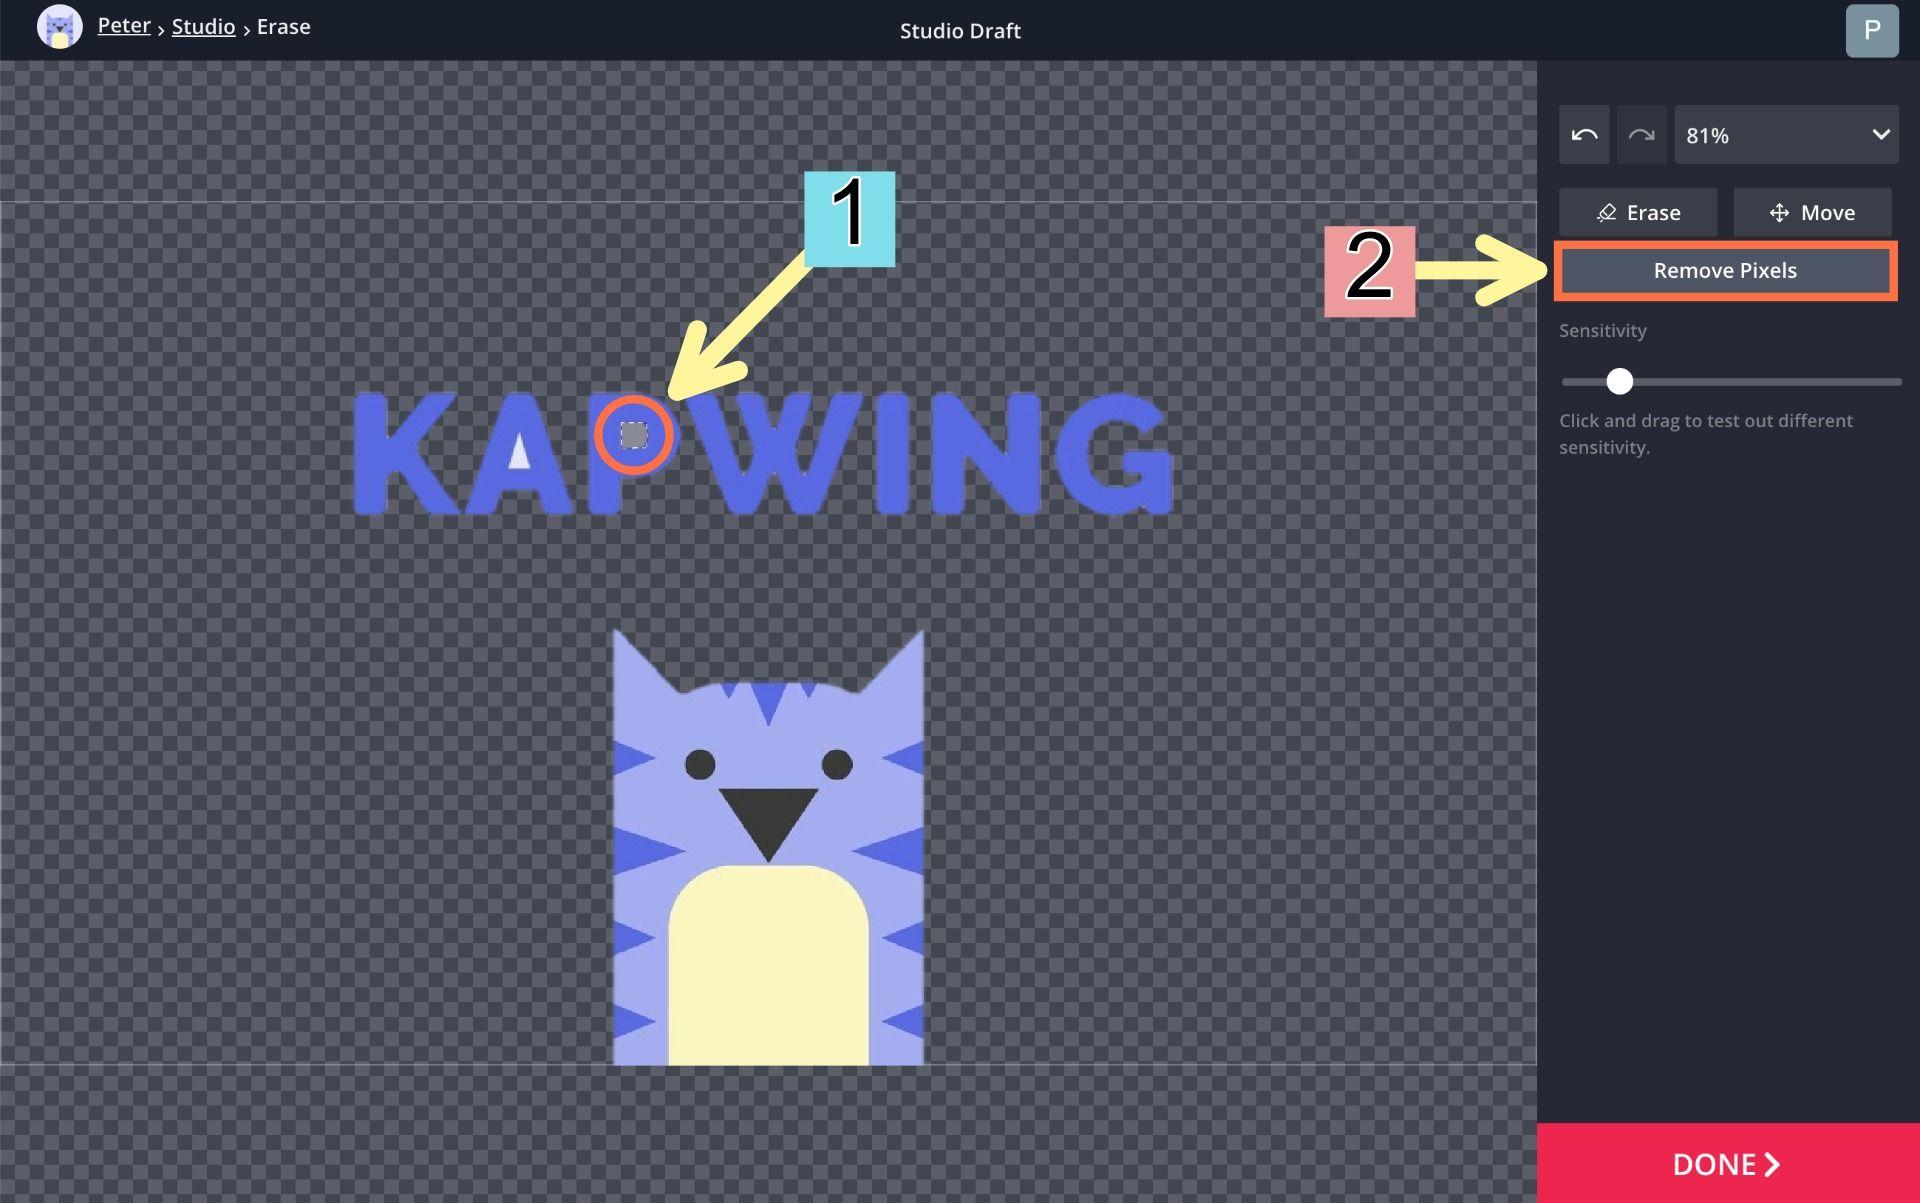 select magic wand tool to remove pixels